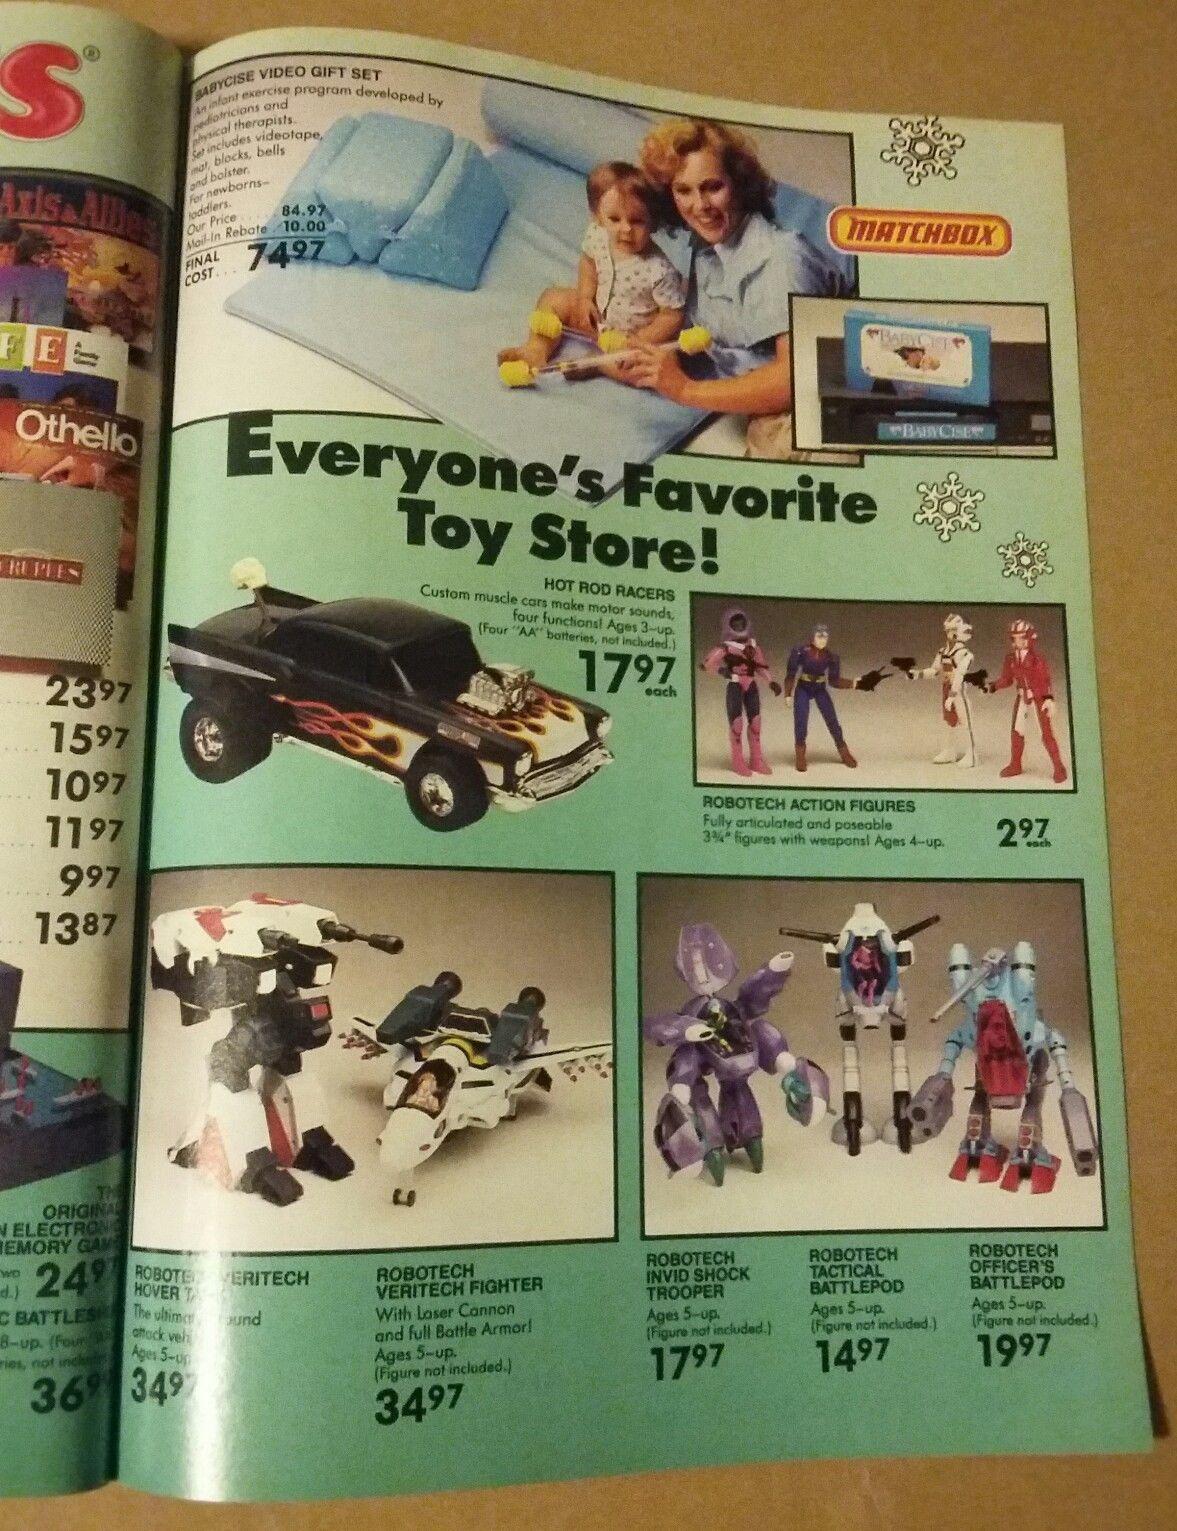 Toys R Us Christmas Book 2020 1986 Toys R Us Christmas Dream Book Catalog Toys Mattel | eBay in